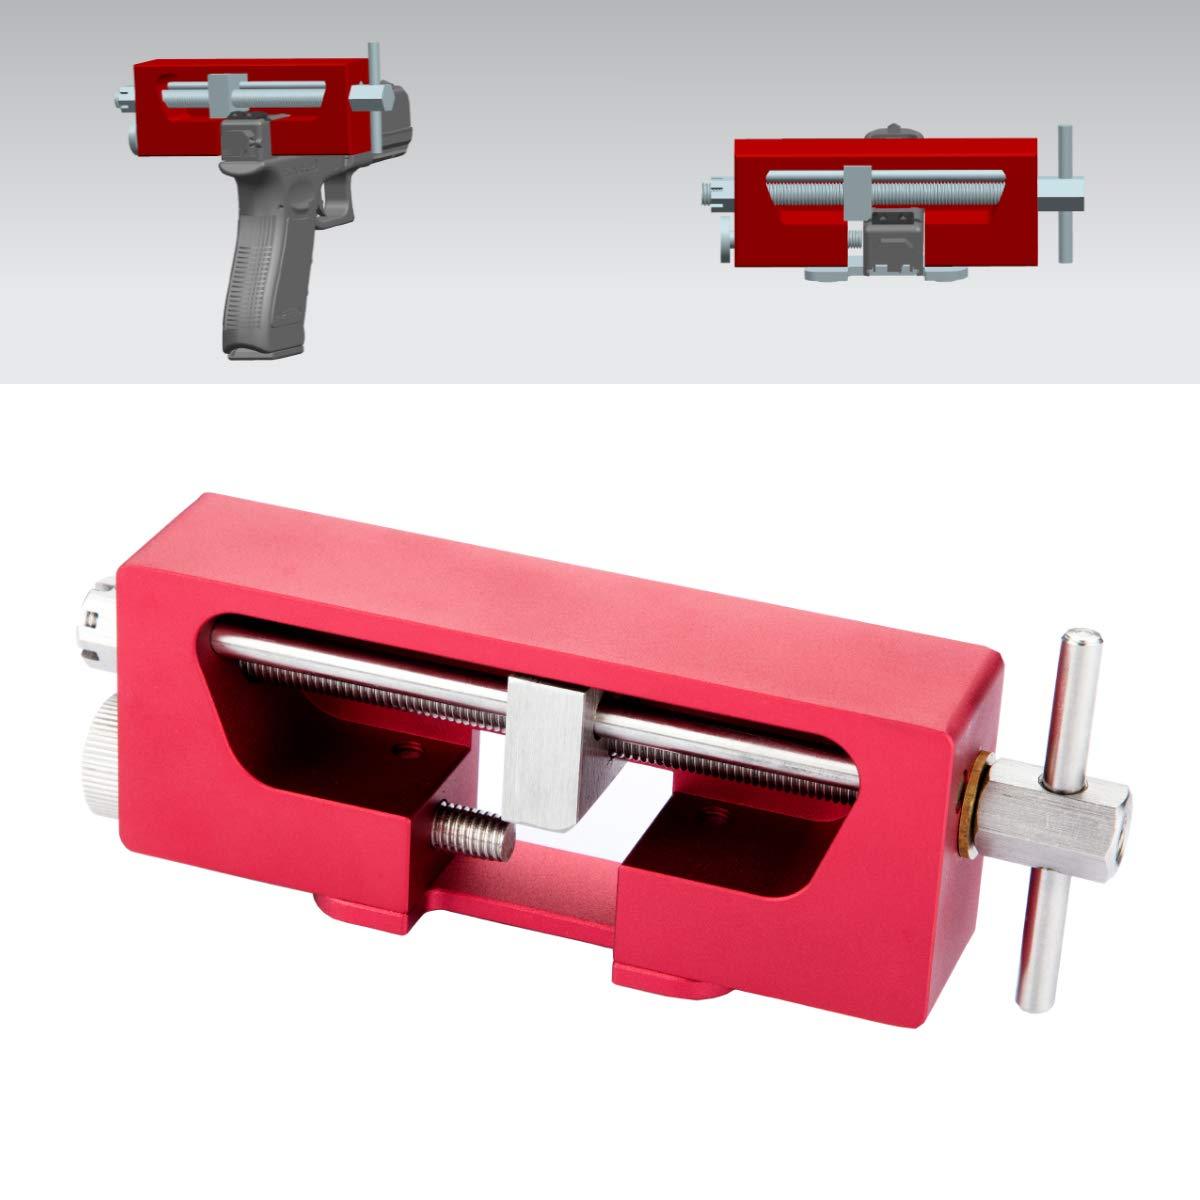 TuFok Pistol Sight Pusher Tool - Universal Pistol Dovetailed Rear Sight Romover by TuFok